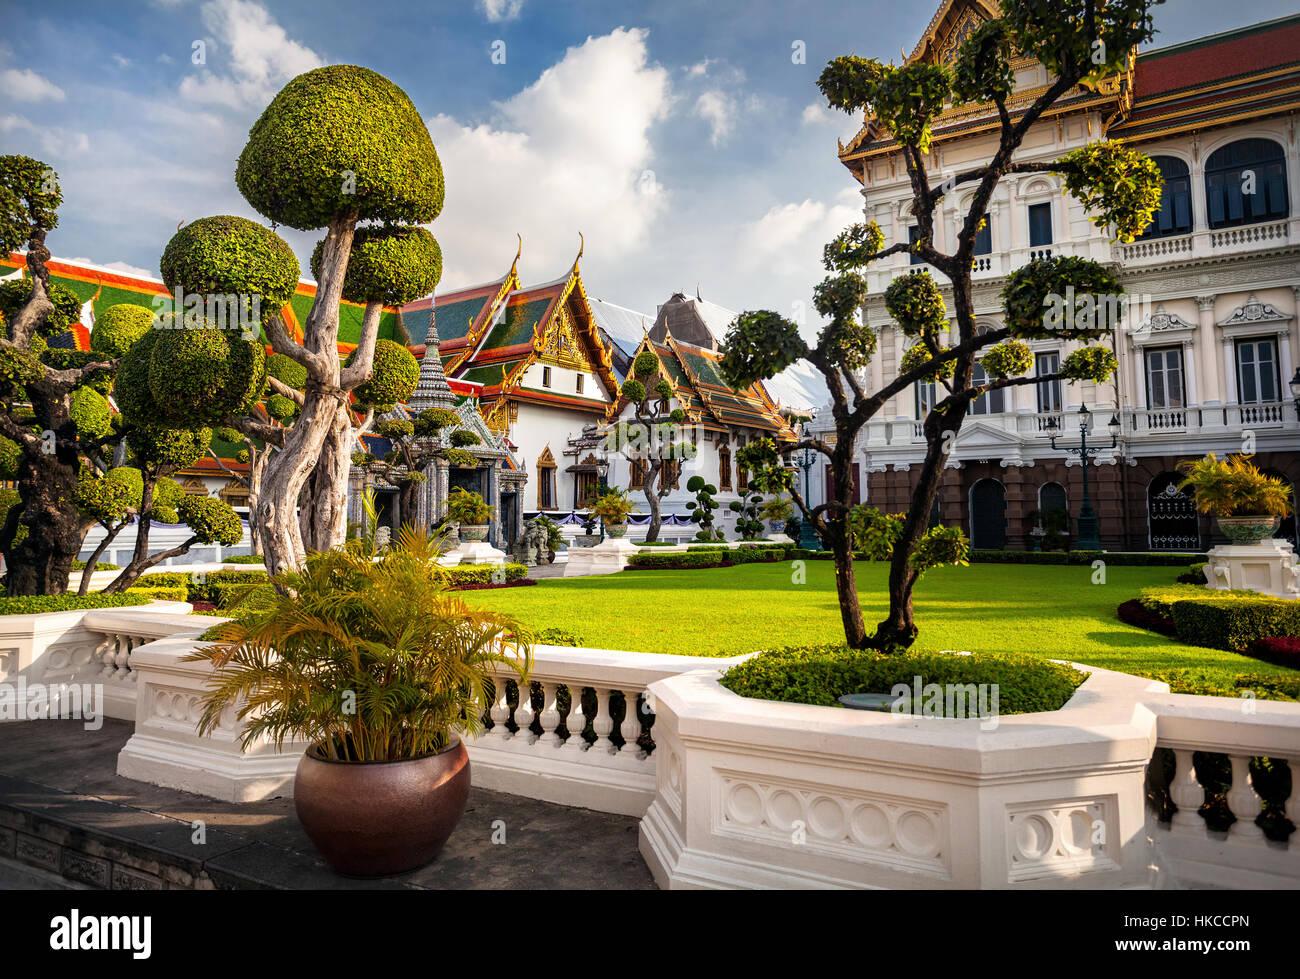 Grand Palace mit topiary Garten am sonnigen Tag in Bangkok, Thailand Stockbild